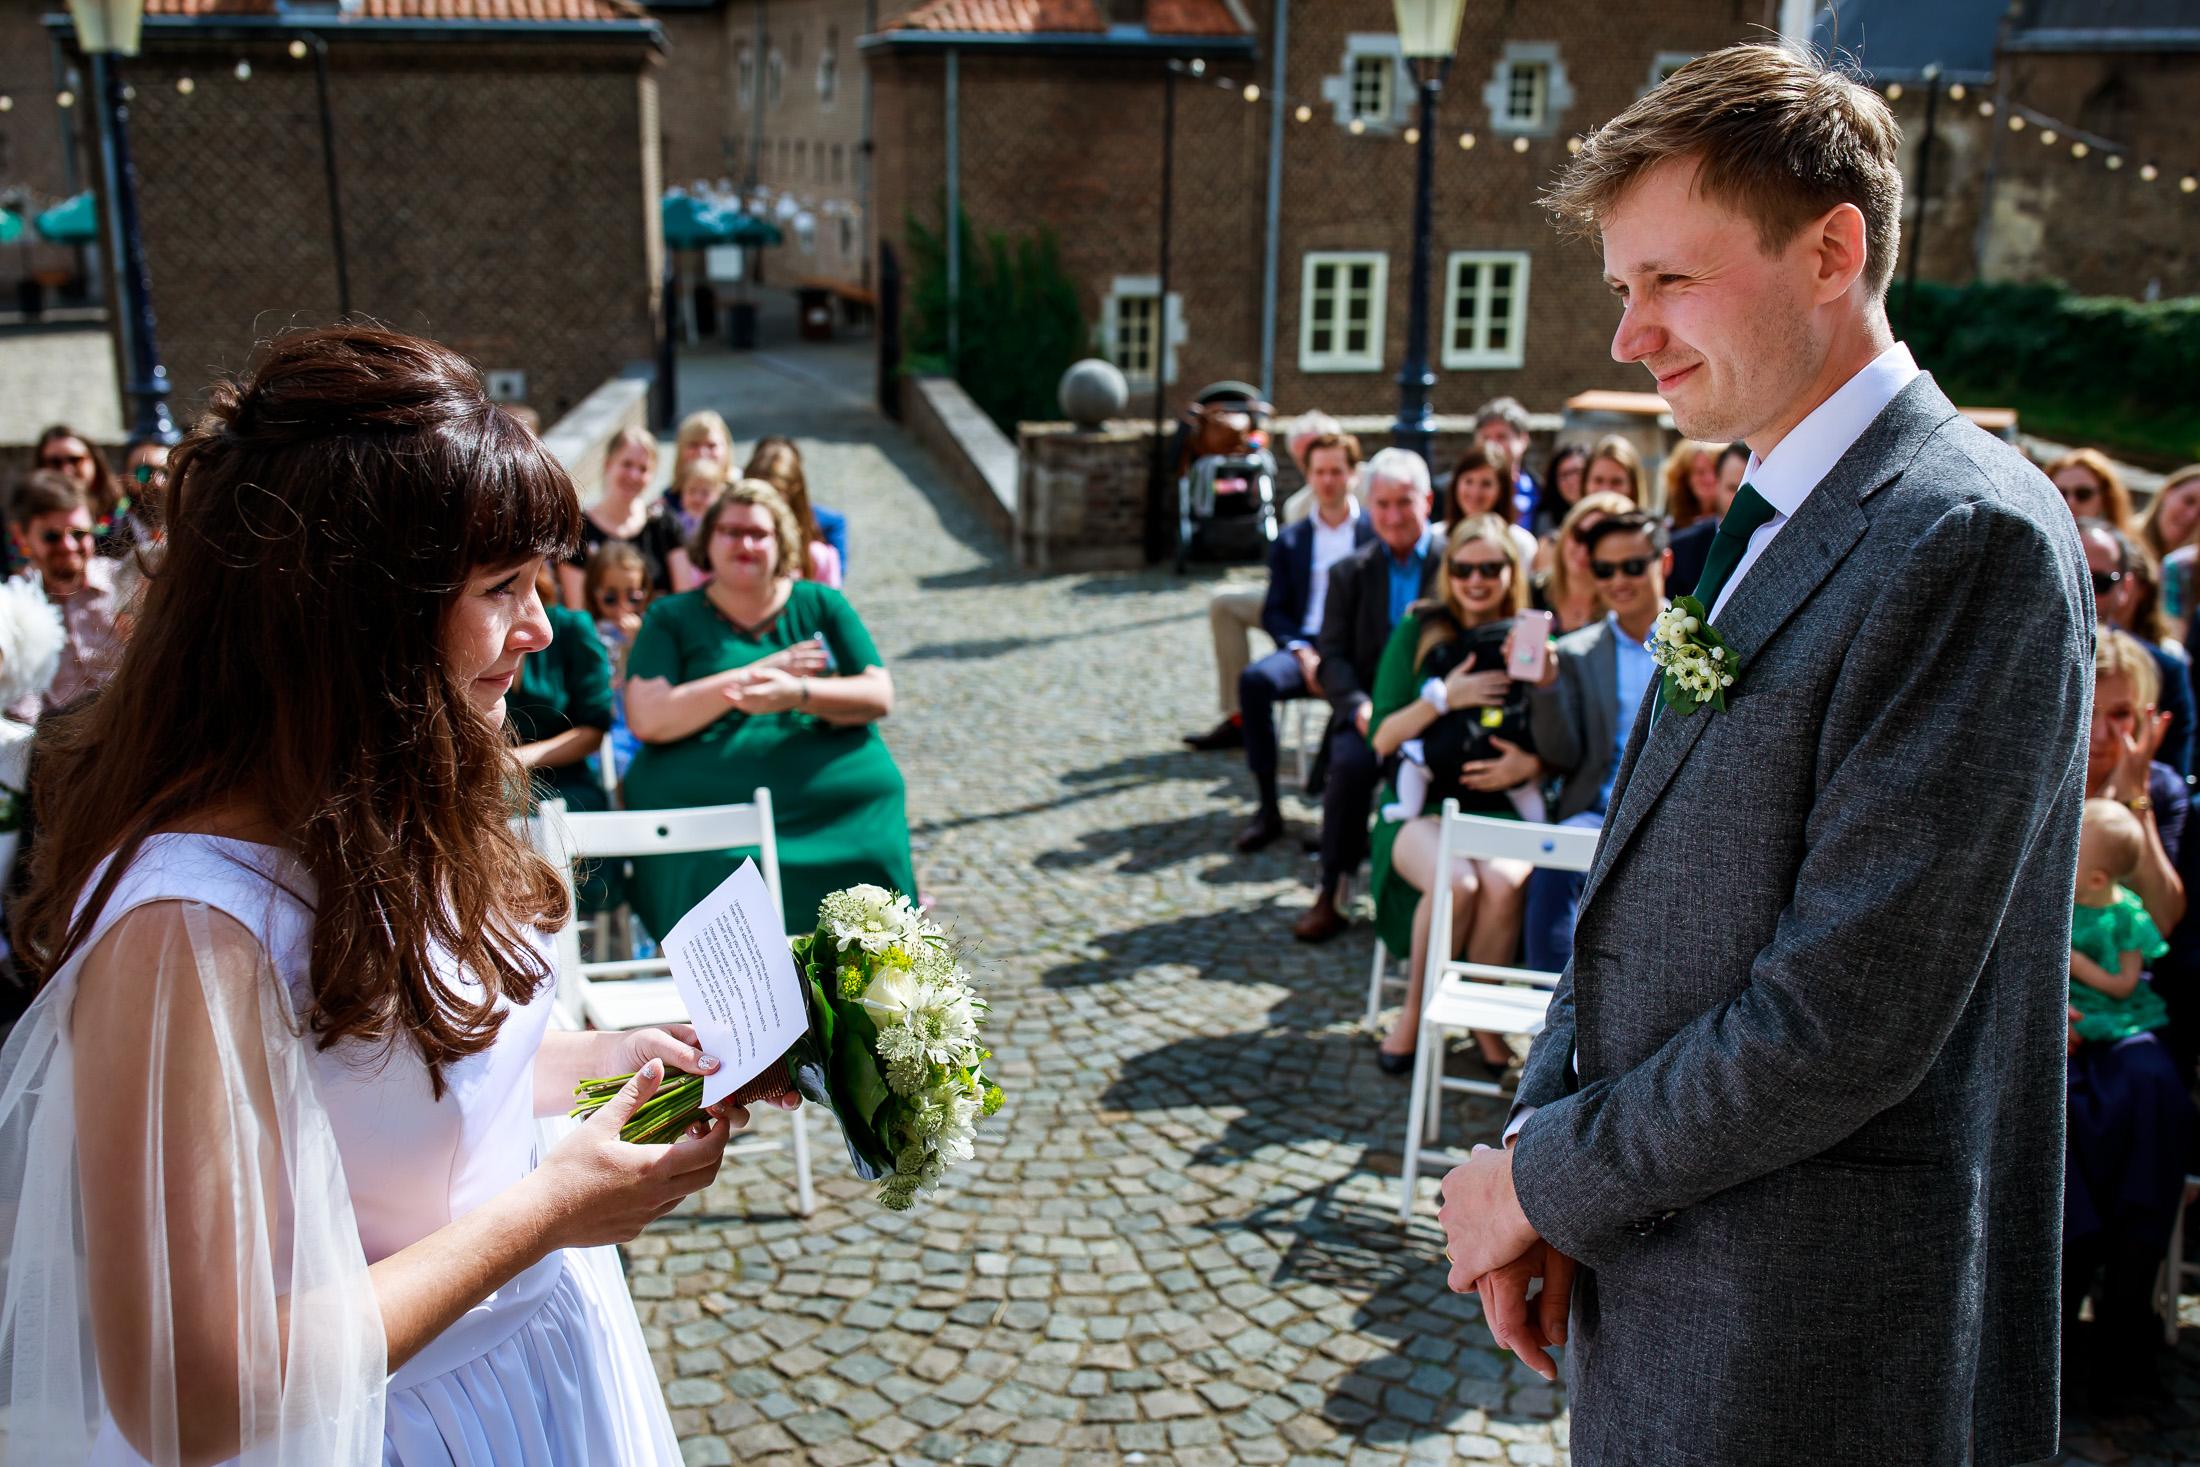 Trouwen bij Kasteel Limbricht   Trouwen in Limburg   Trouwfotograaf Limburg   Trouwceremonie